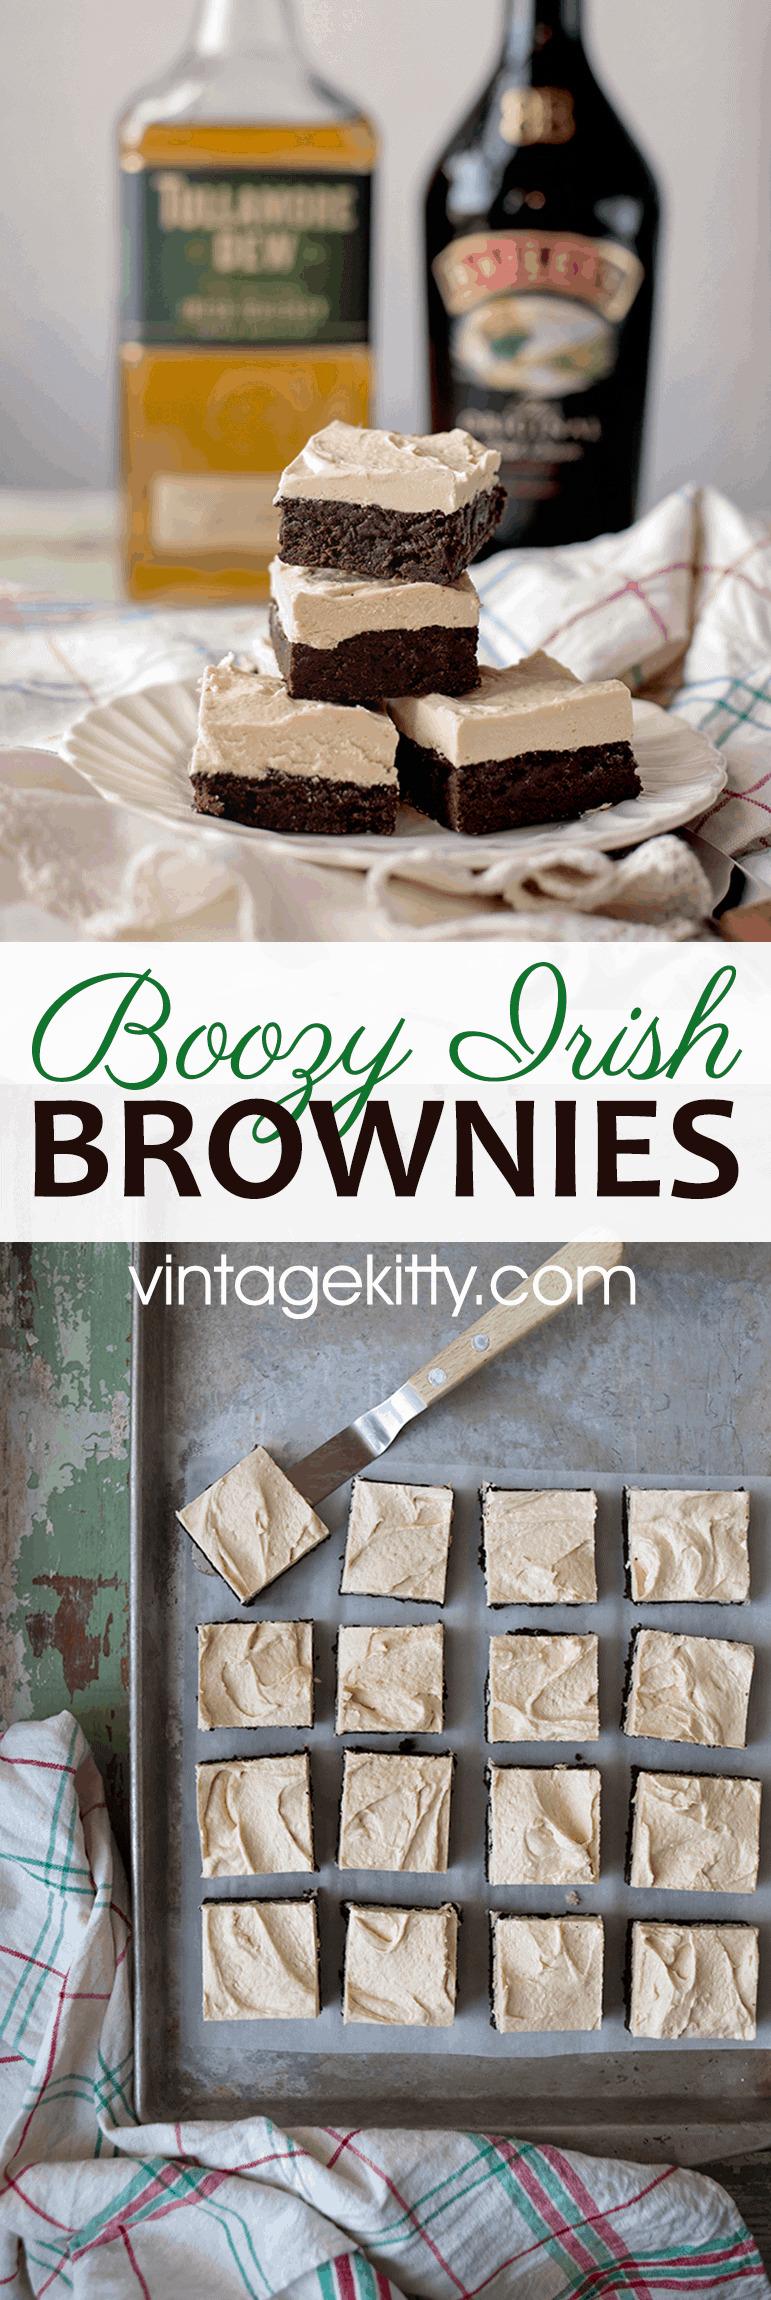 Boozy Irish Brownies - Boozy Irish Brownies with Irish Cream Whiskey Ganache